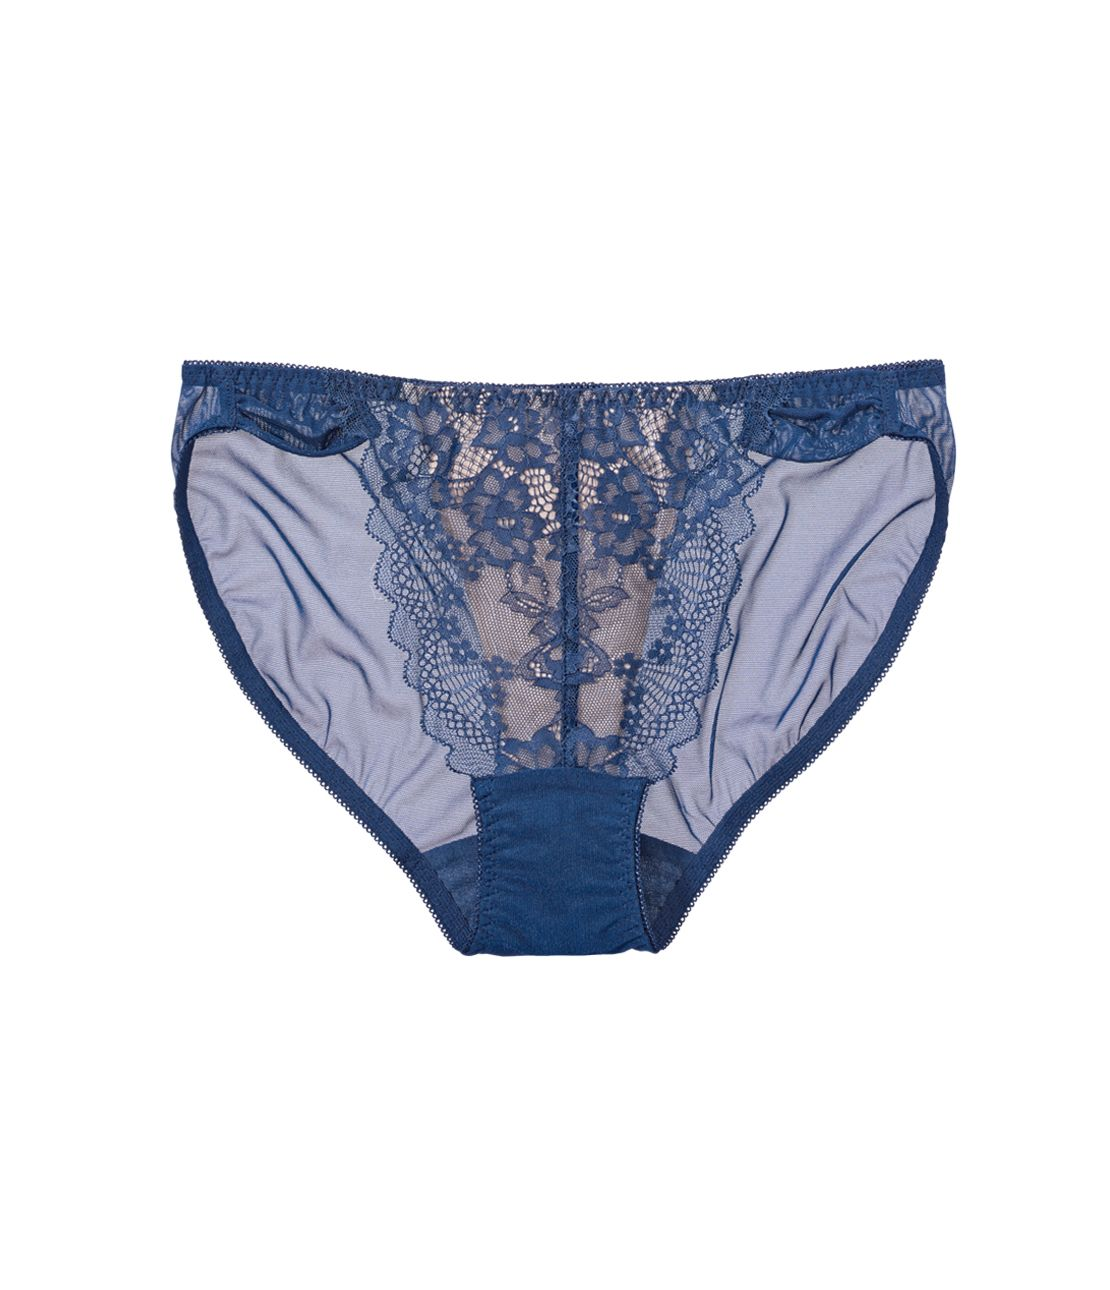 Gran Dena Pell Fetta Minimizer panty